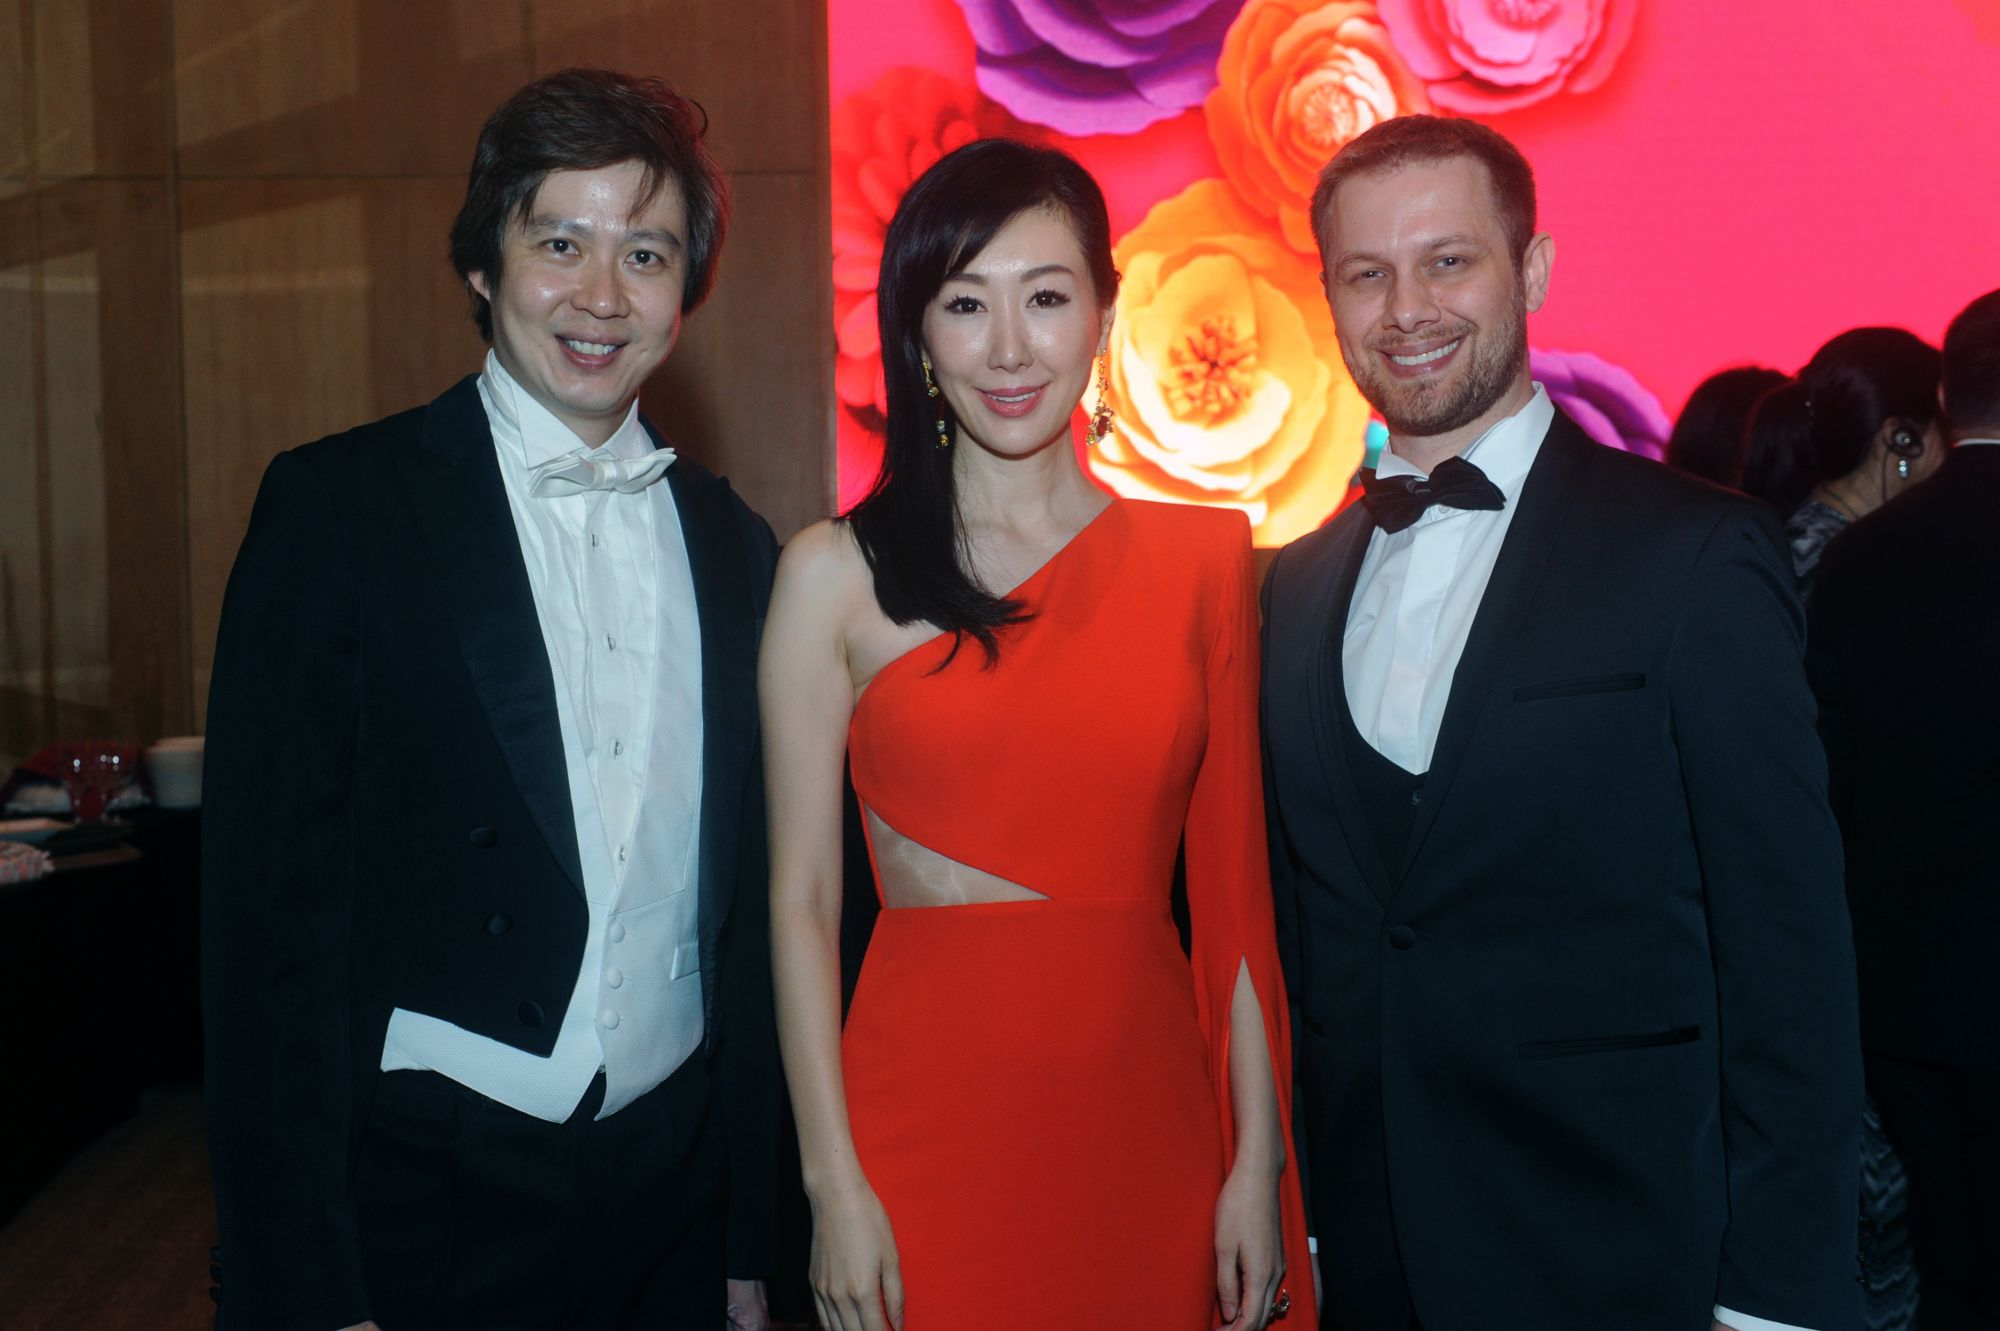 Joshua Tan, Seia Lee, Zoltan Nagy